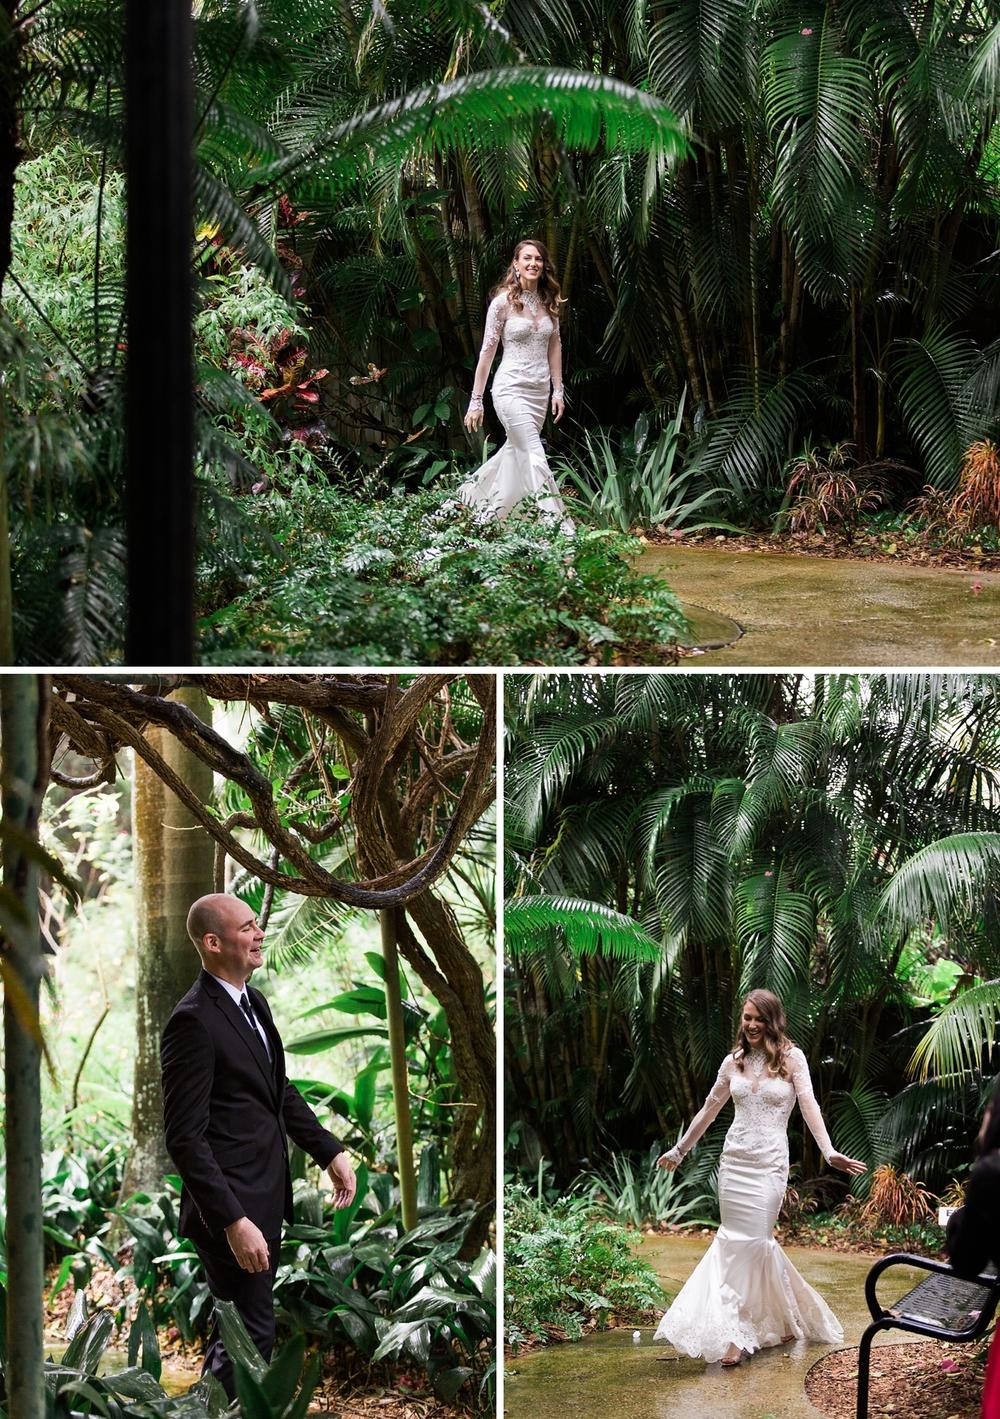 orlando-wedding-photography-justin-gilbert-tampa-sunken-gardens_0007.jpg